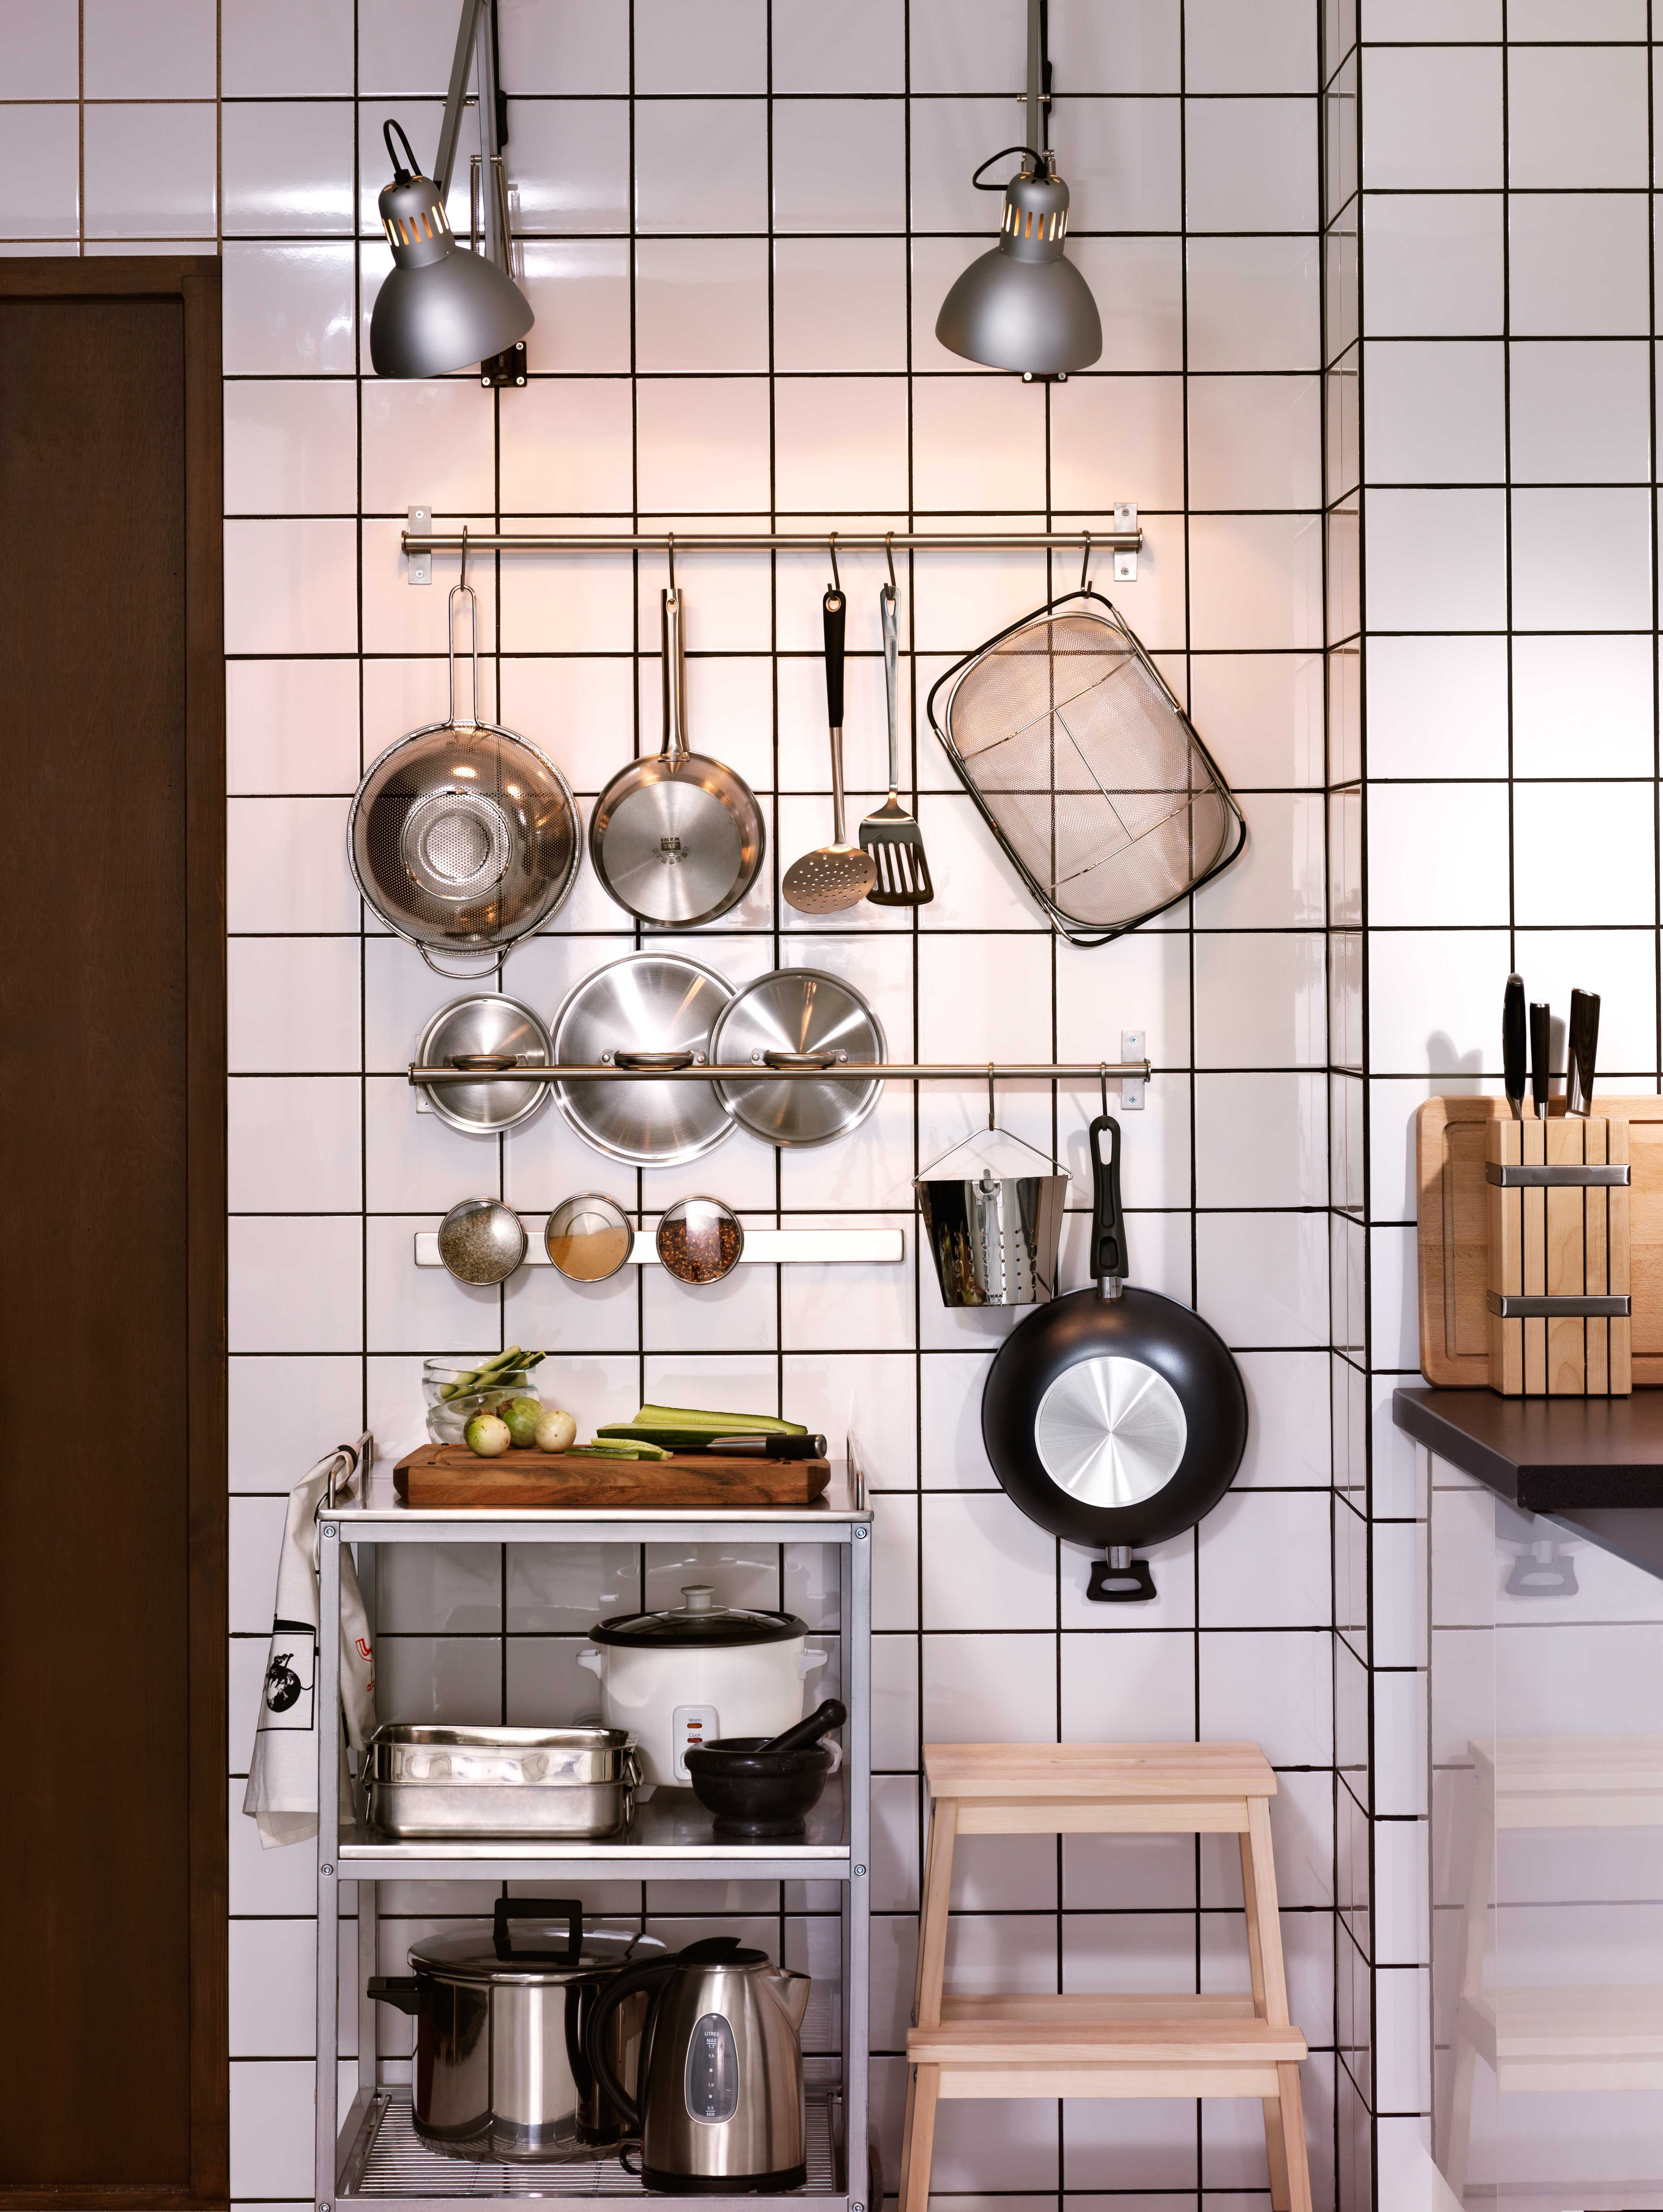 Kuchenmobel Kuchengerate Gunstig Kaufen Ikea Pinterest Kuche